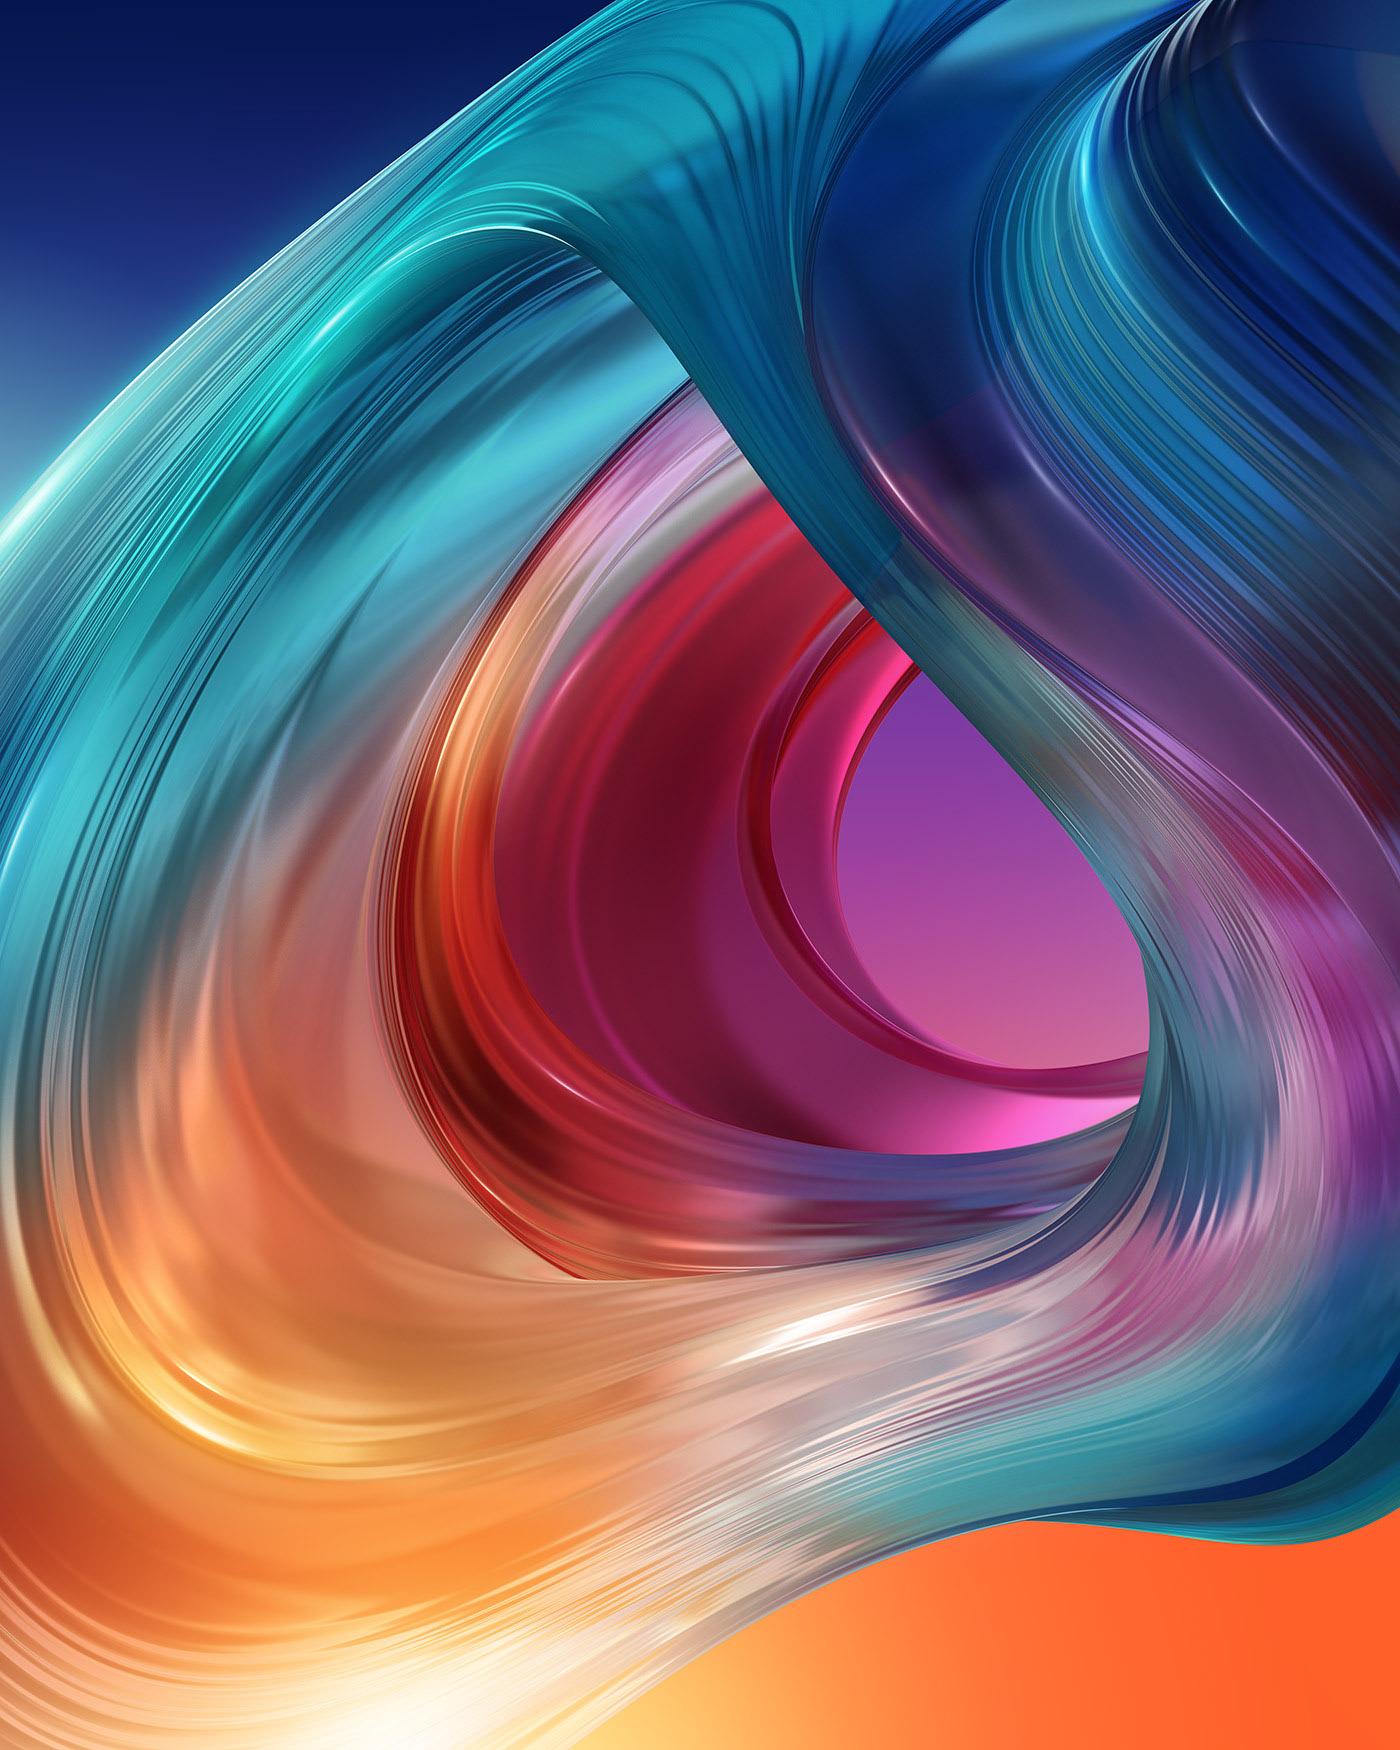 Illustration,Art Direction,Digital Art